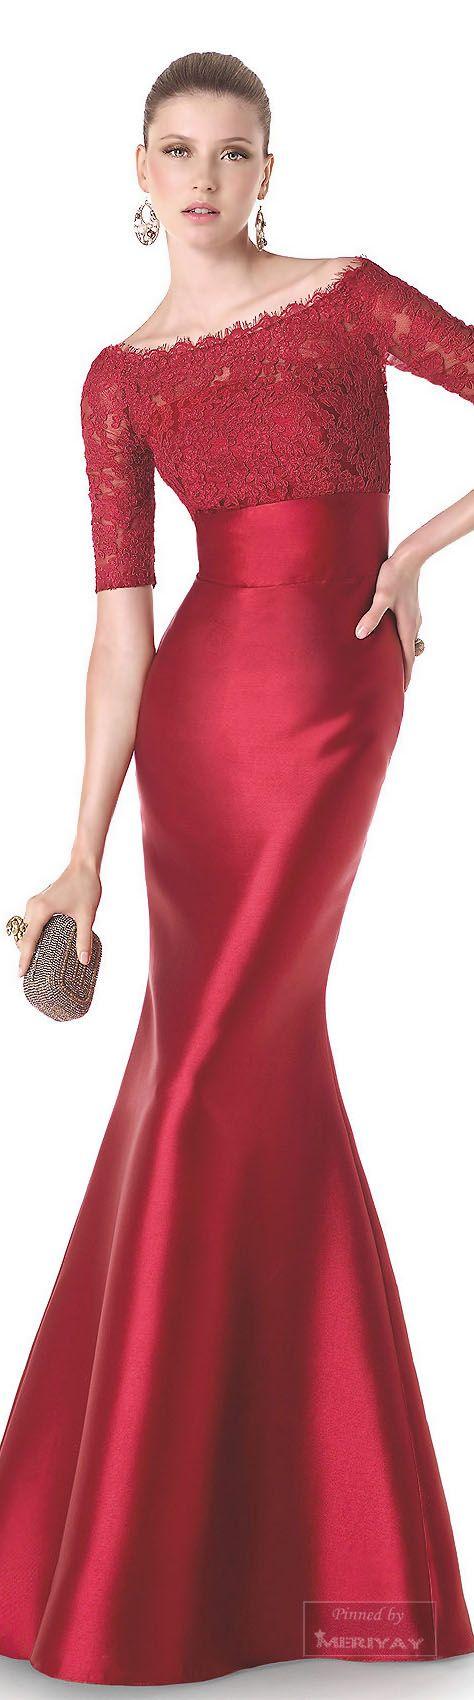 Vermelho longo vestido pinterest runway saints and gowns